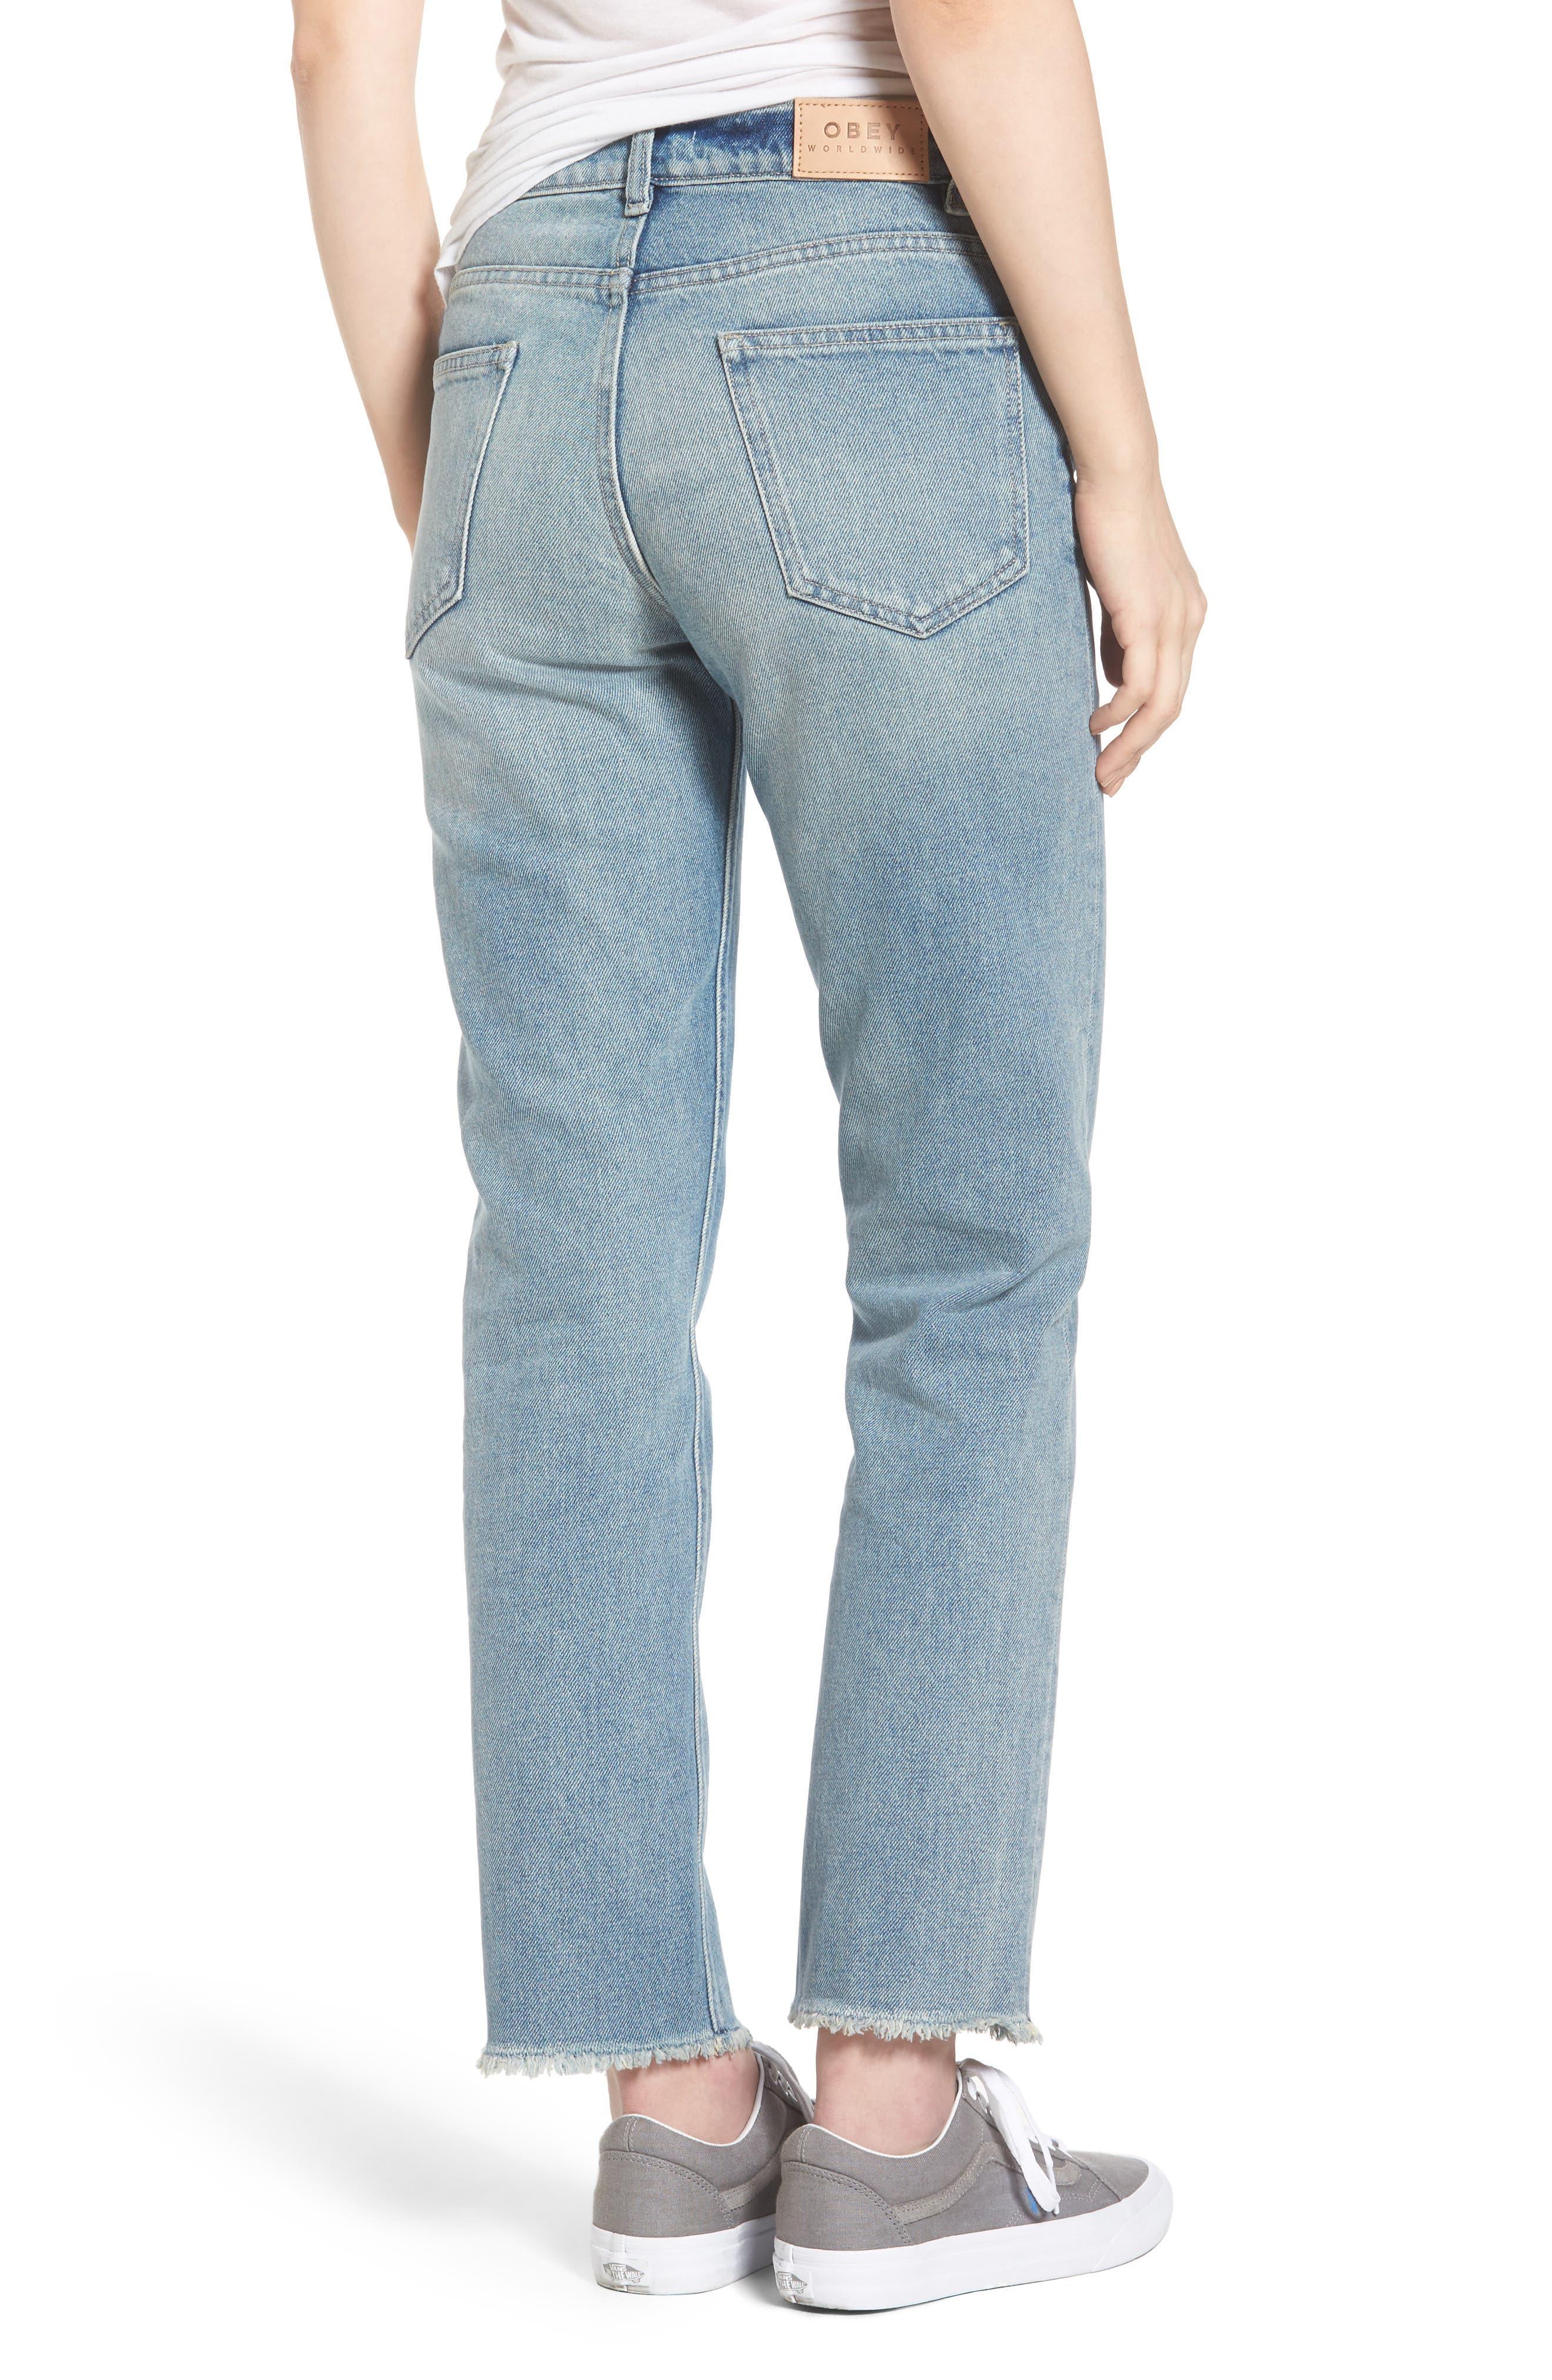 Sundays Straggler High Waist Jeans,                             Alternate thumbnail 2, color,                             Bleached Indigo